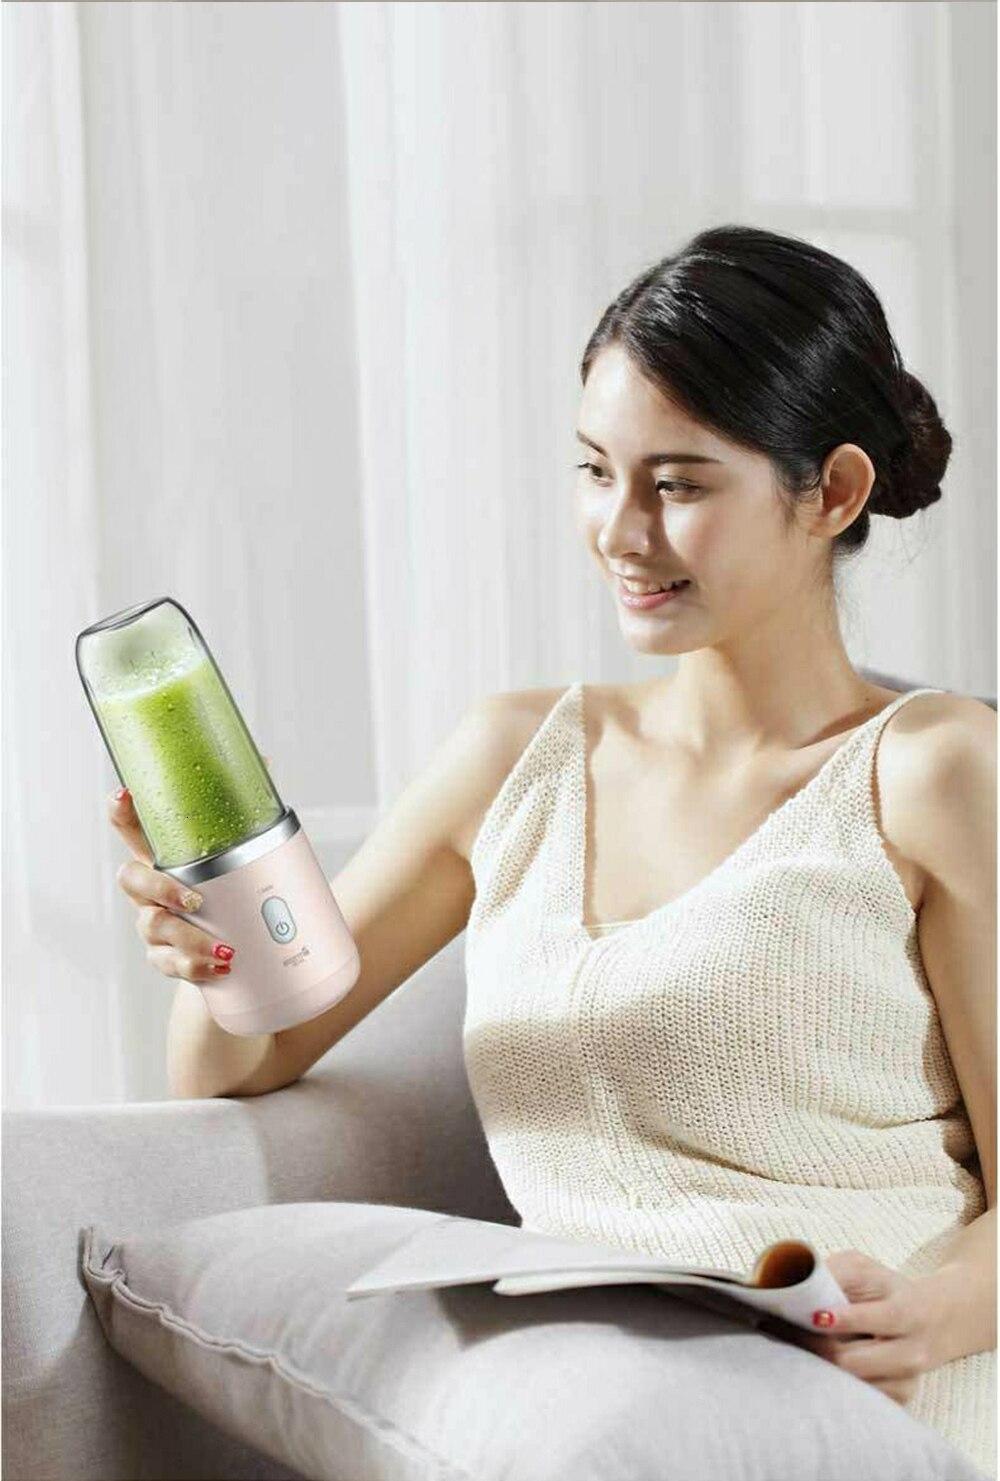 Hf34088c2b0d14d29845a362087d1f9c6O Xiaomi Deerma Portable Blender Electric Juicer 400ML Wireless Automatic Multipurpose USB Rechargable Mini Juice Cup Cut Mixer